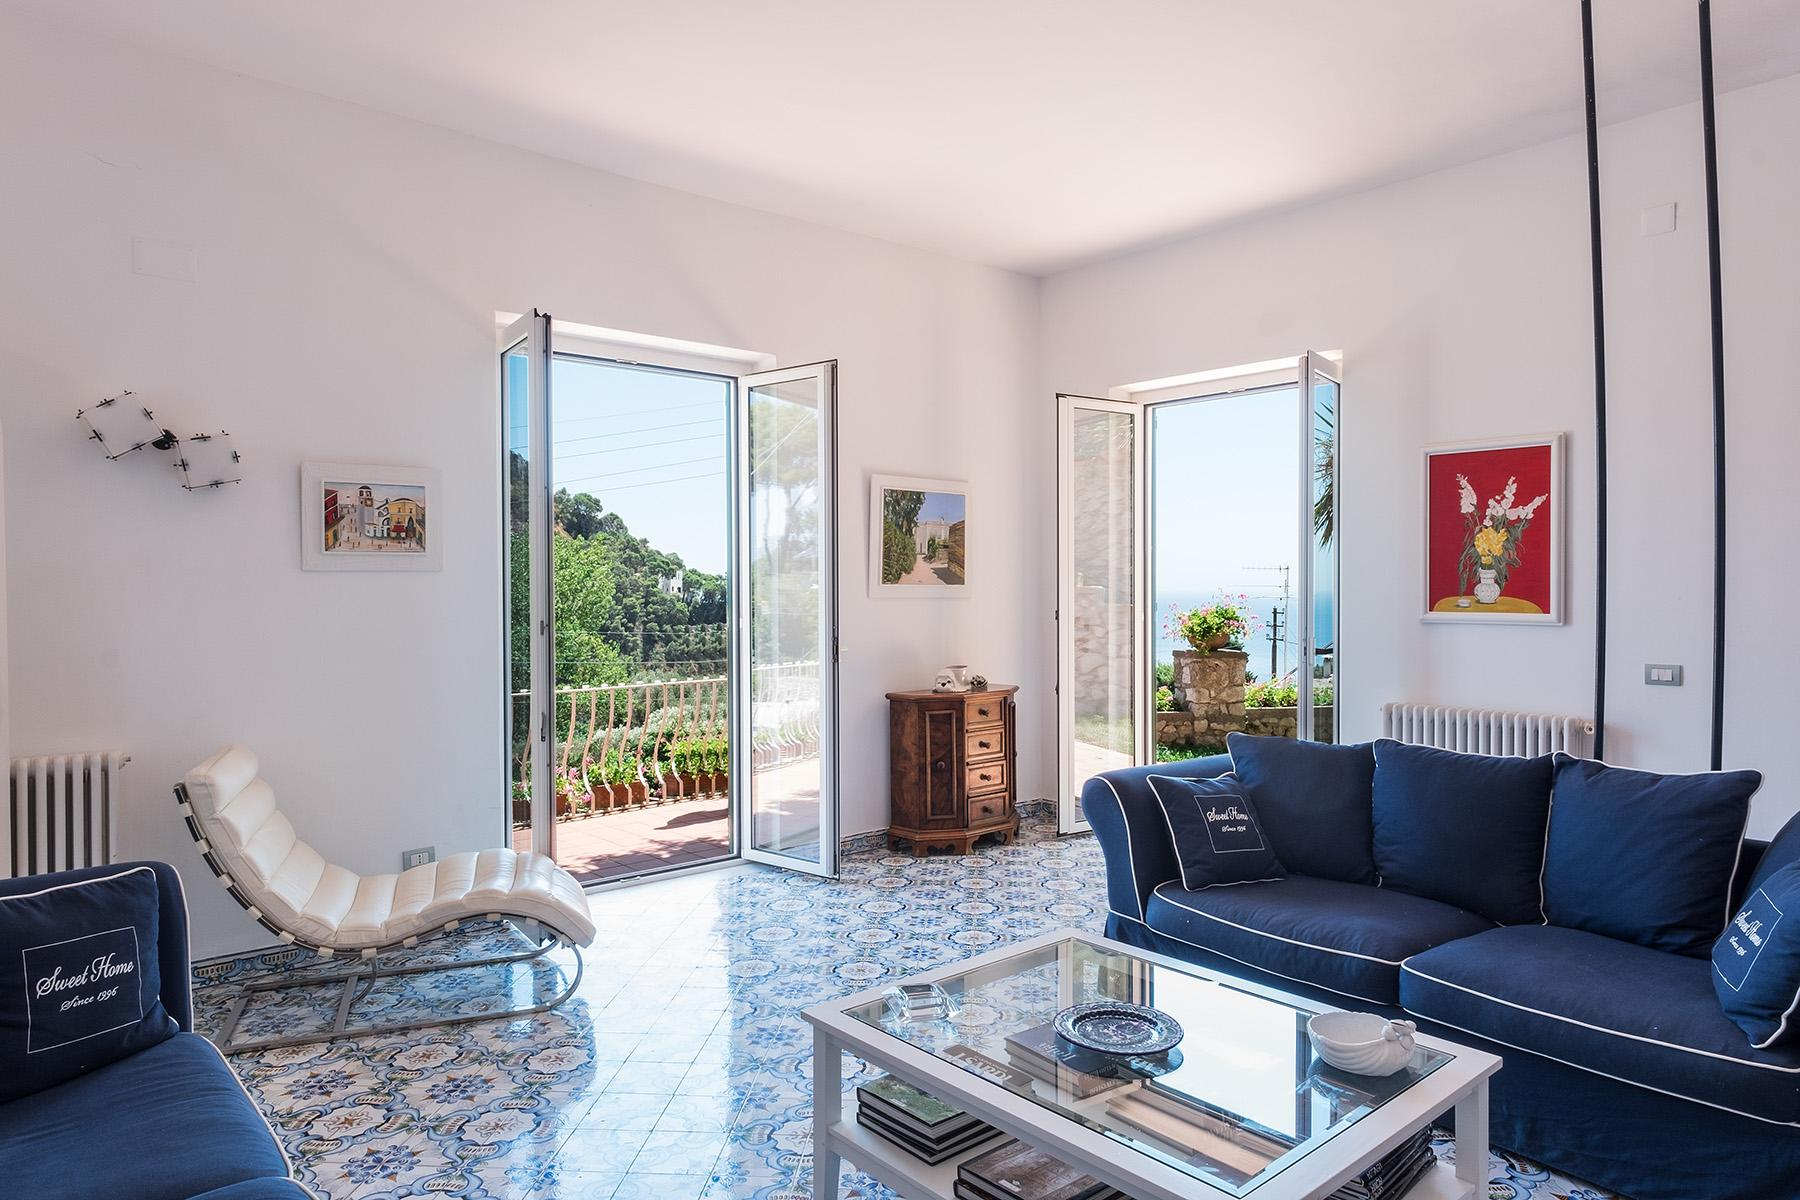 Прекрасная вилла с панорамным видом на море в центре легендарного острова Капри, Италия - 6